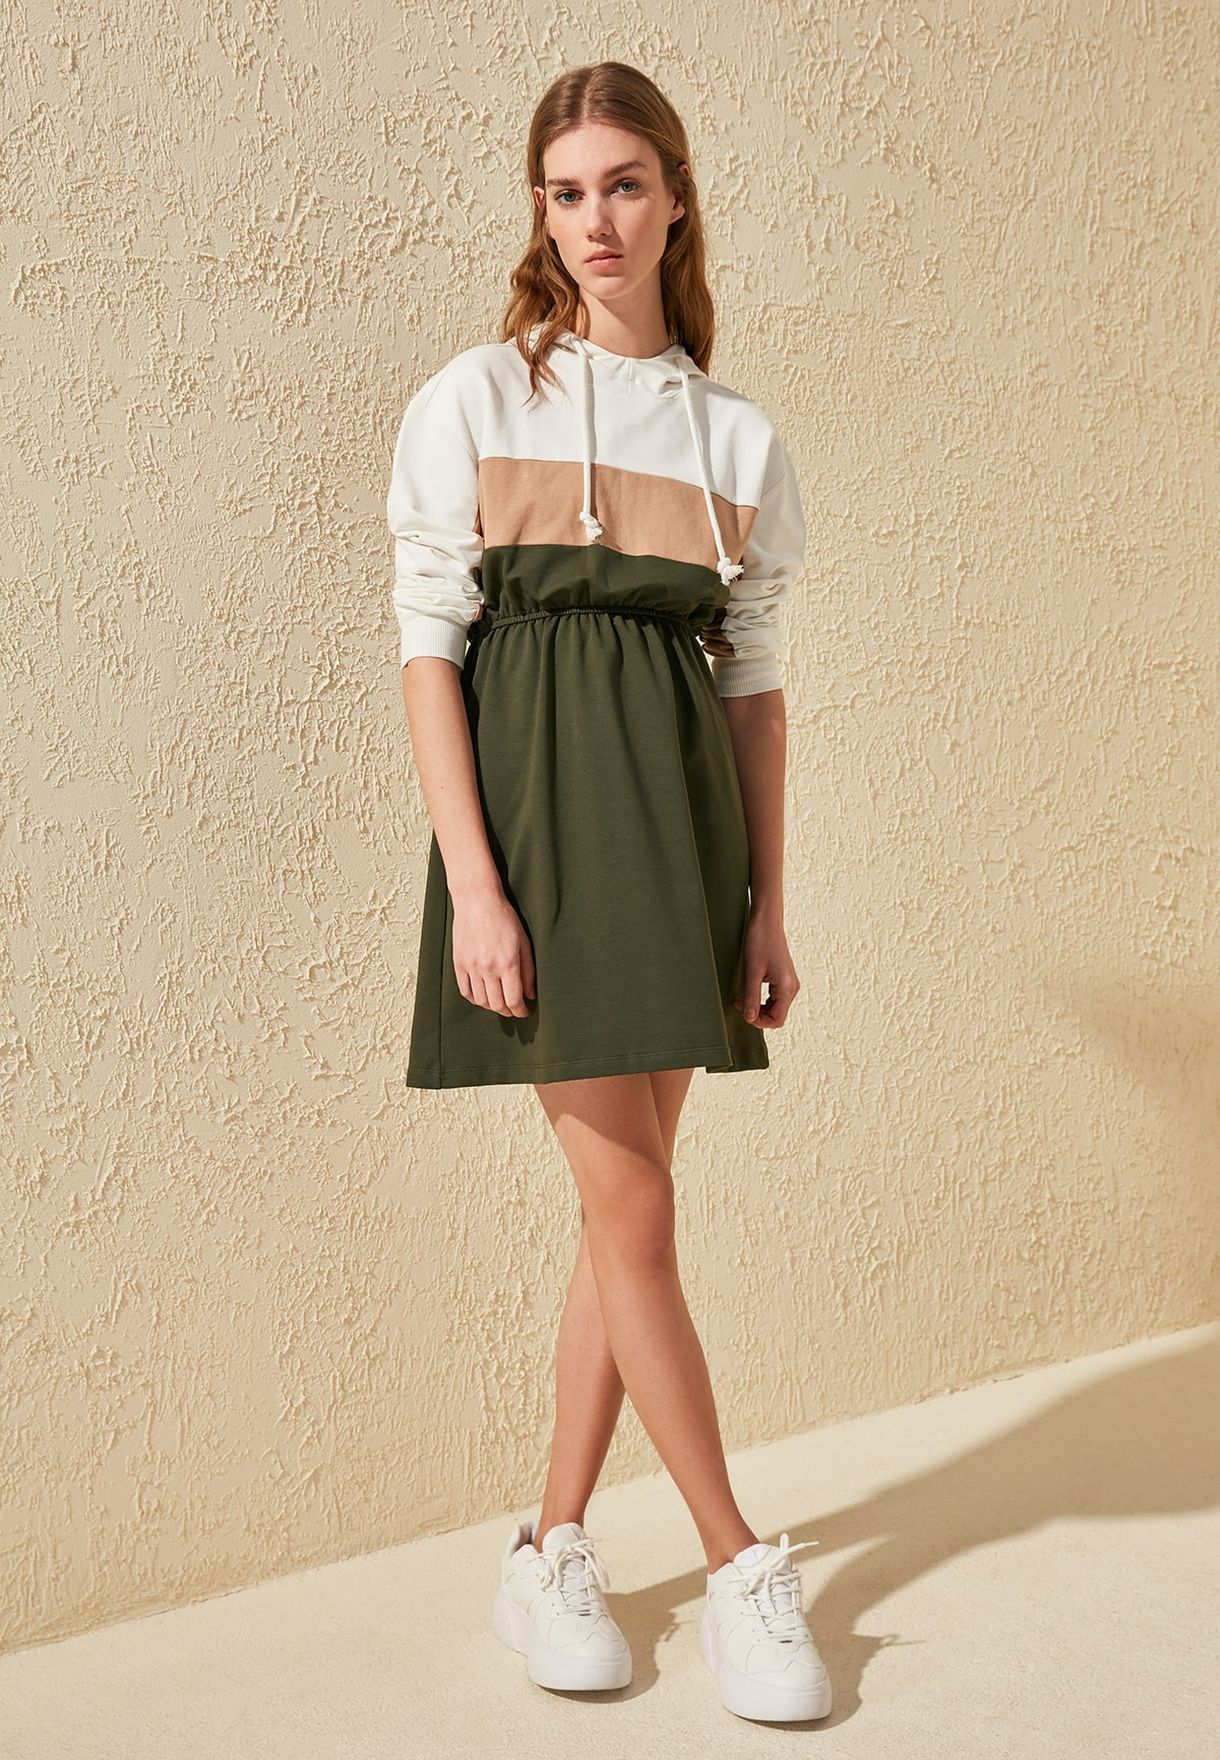 Buy Trendyol Multicolor Colorblock Hooded Sweat Dress For Women, Uae 27680at4uzqp